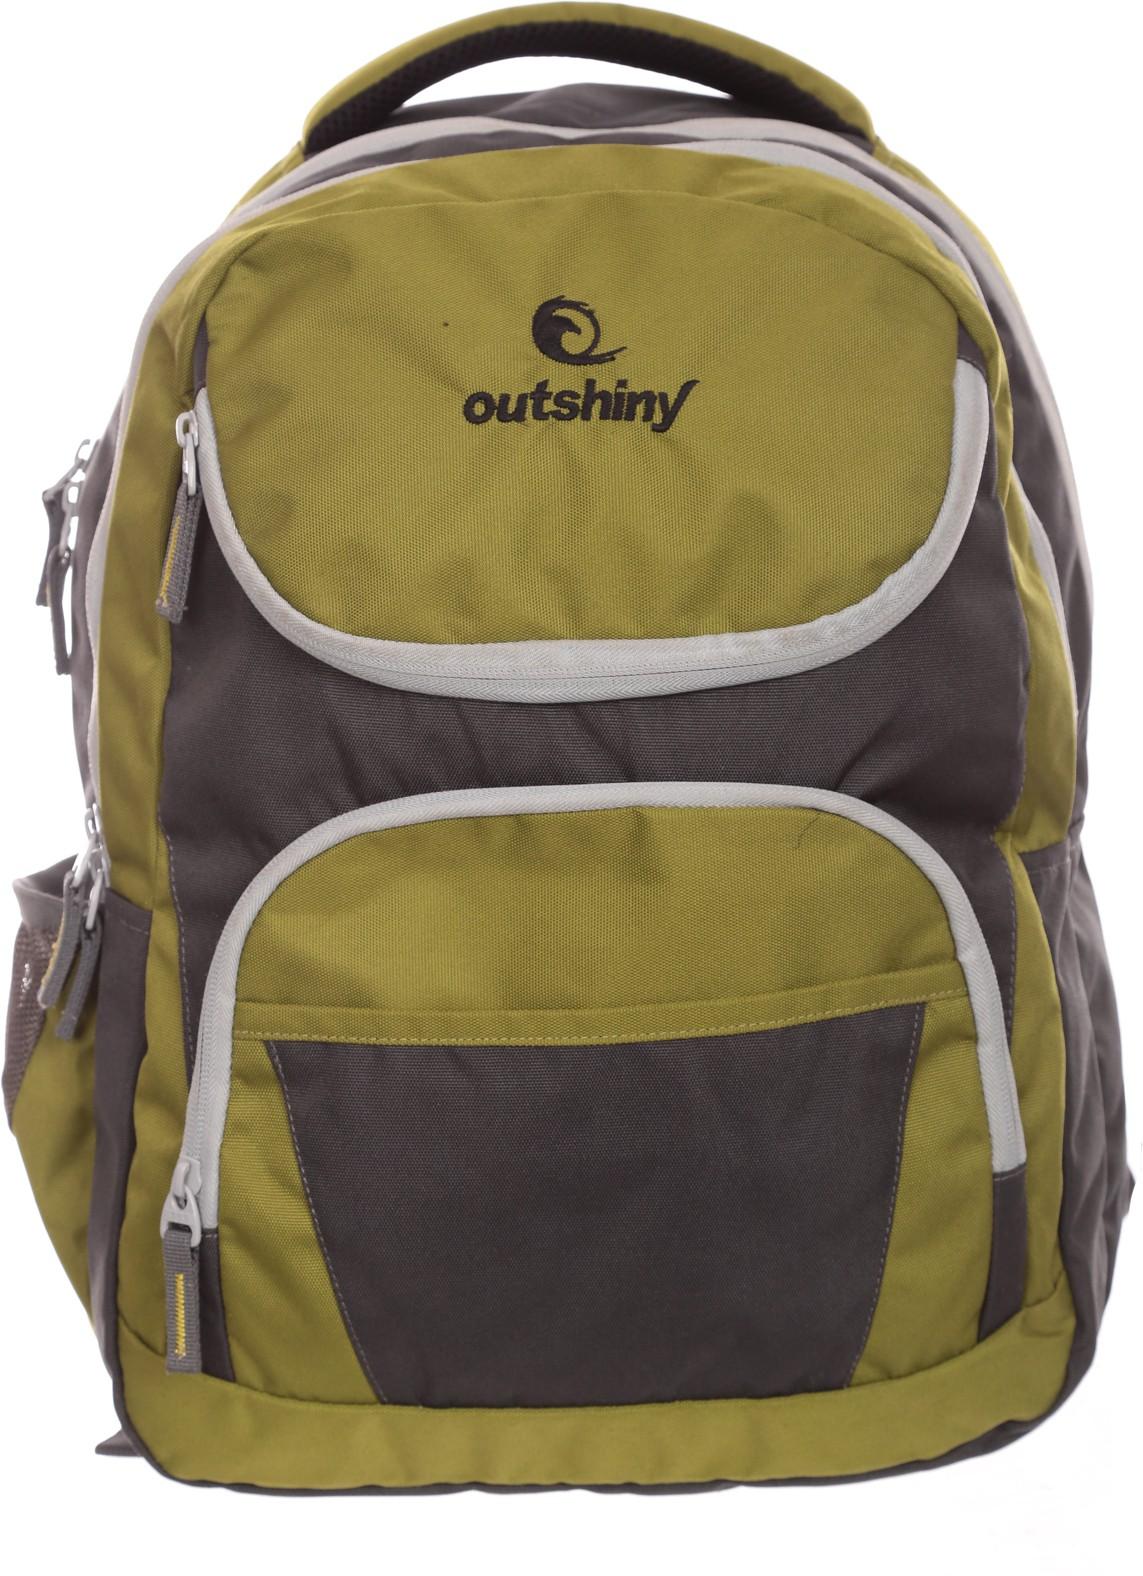 Outshiny yogi otsy Laptop Bag(Multicolor)